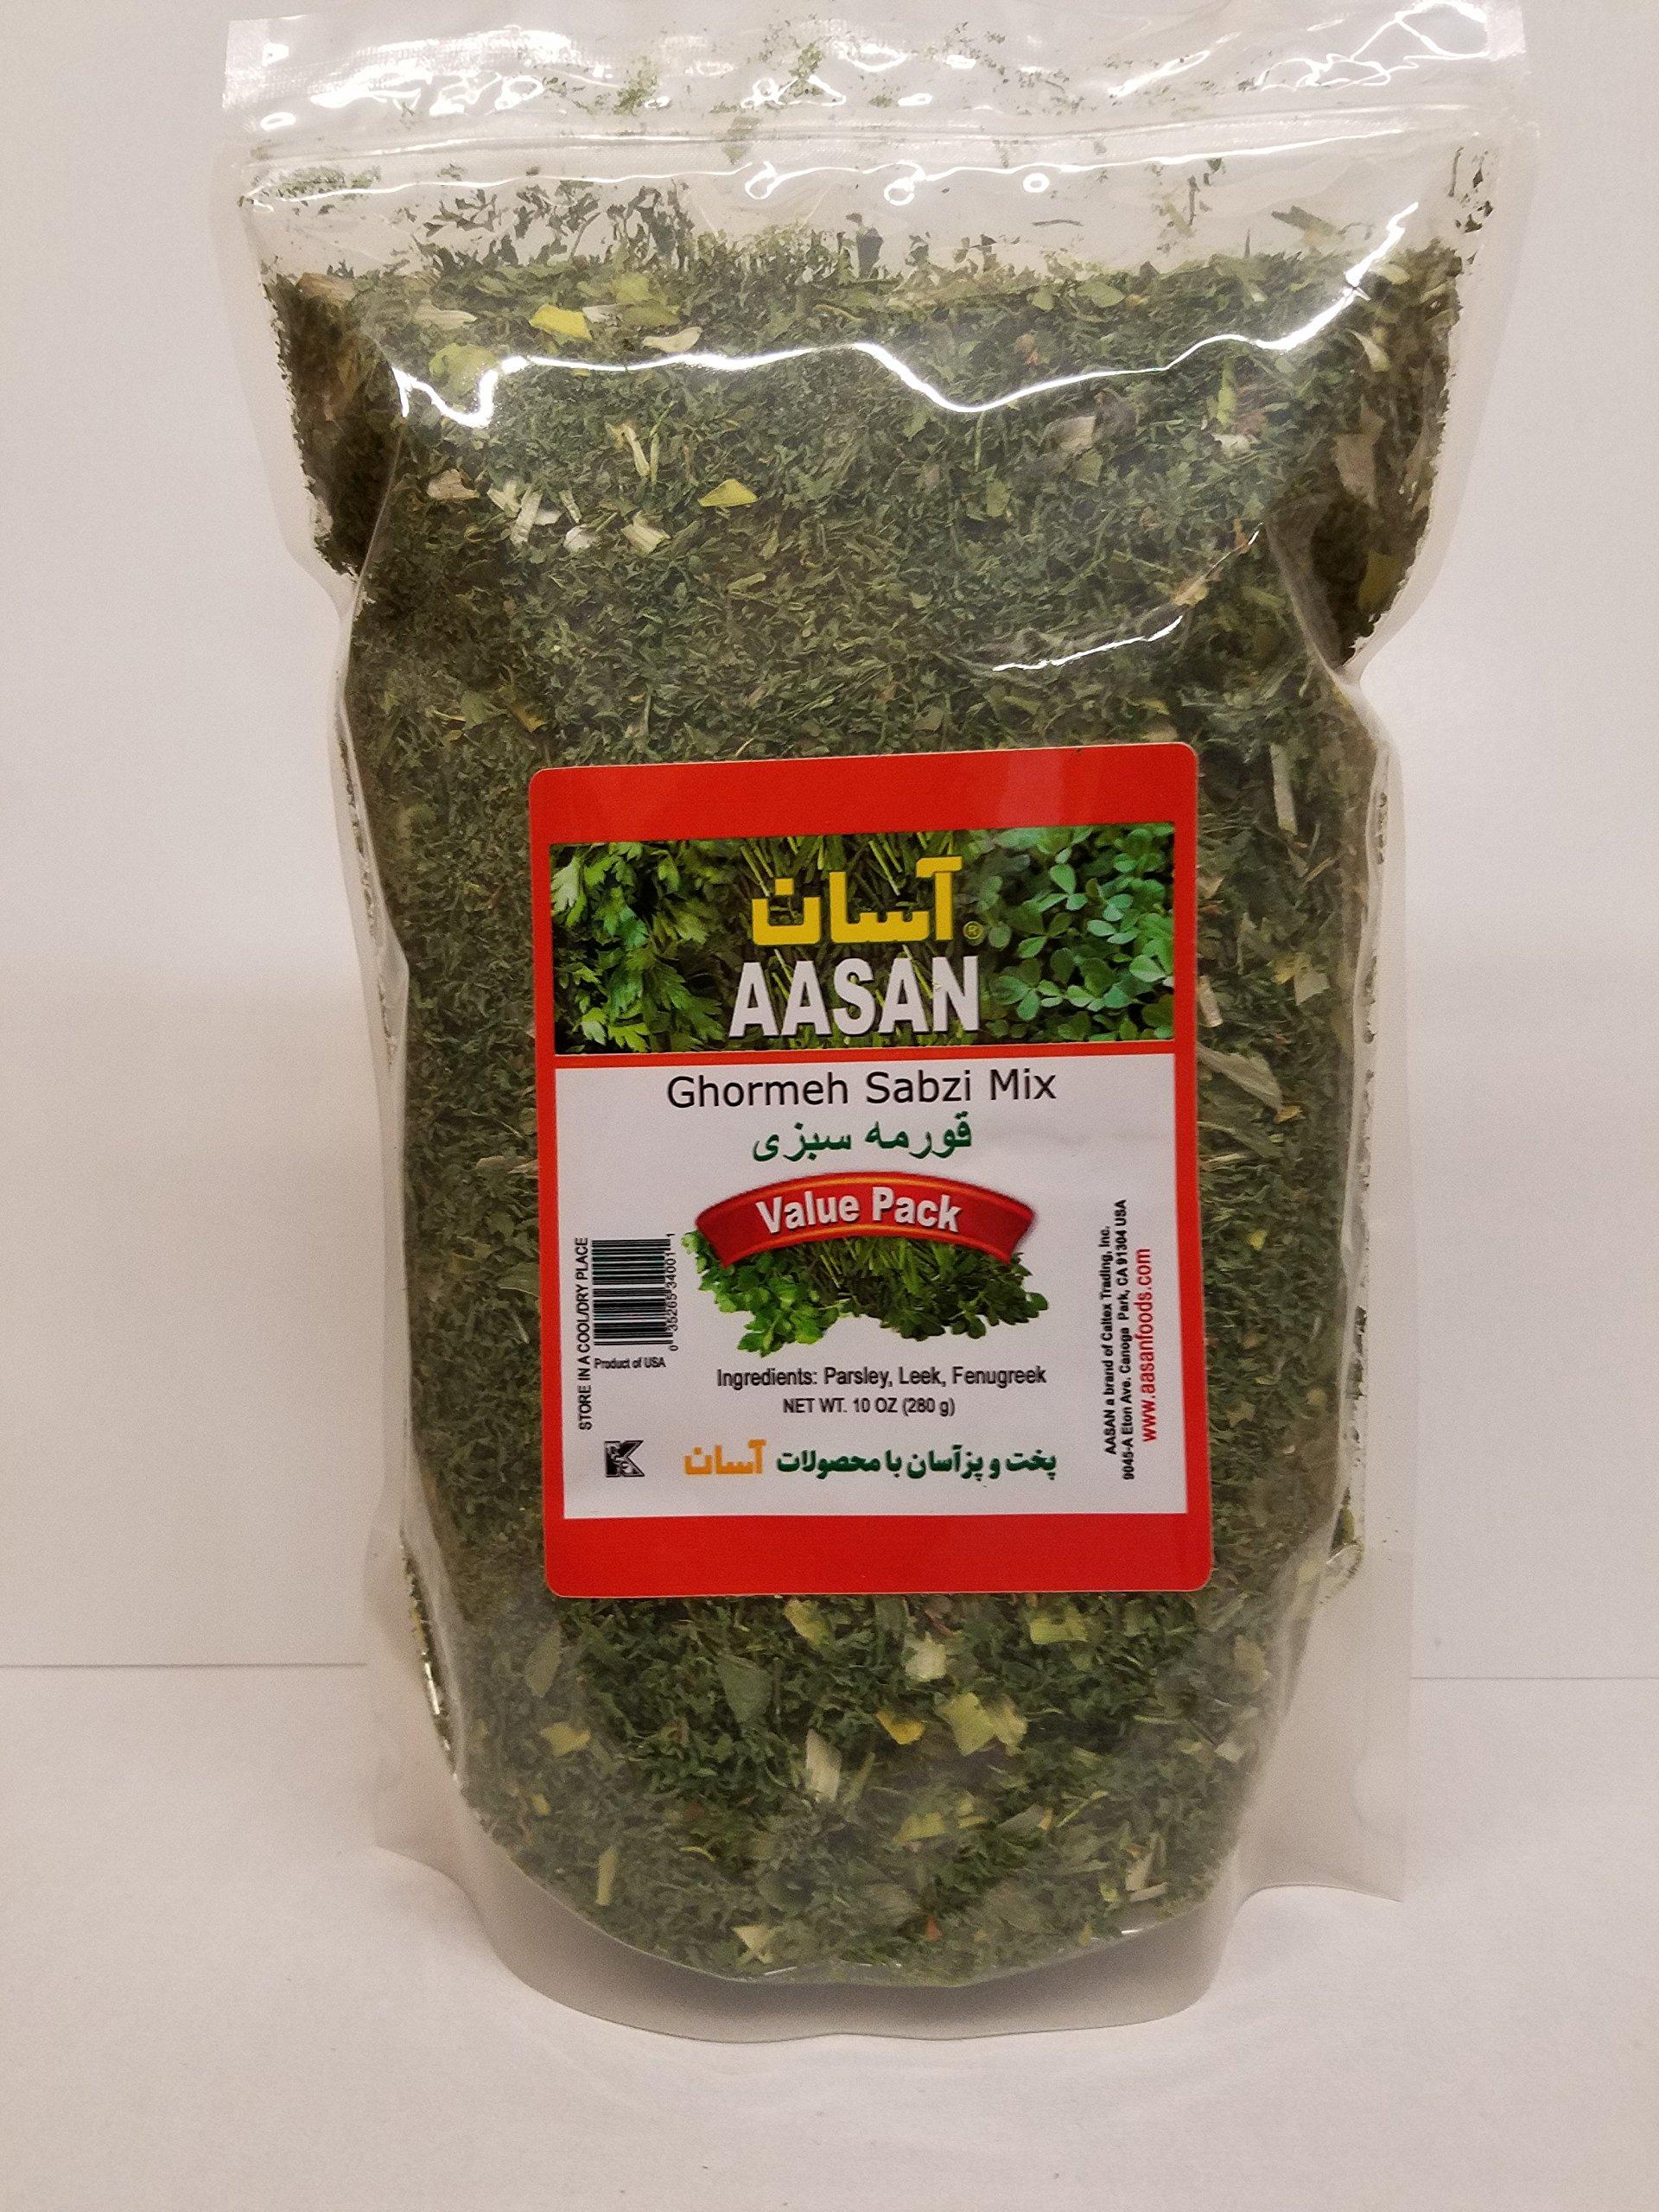 AASAN Ghormeh Sabzi ''VALUE PACK'' 10 oz - Pack of 1